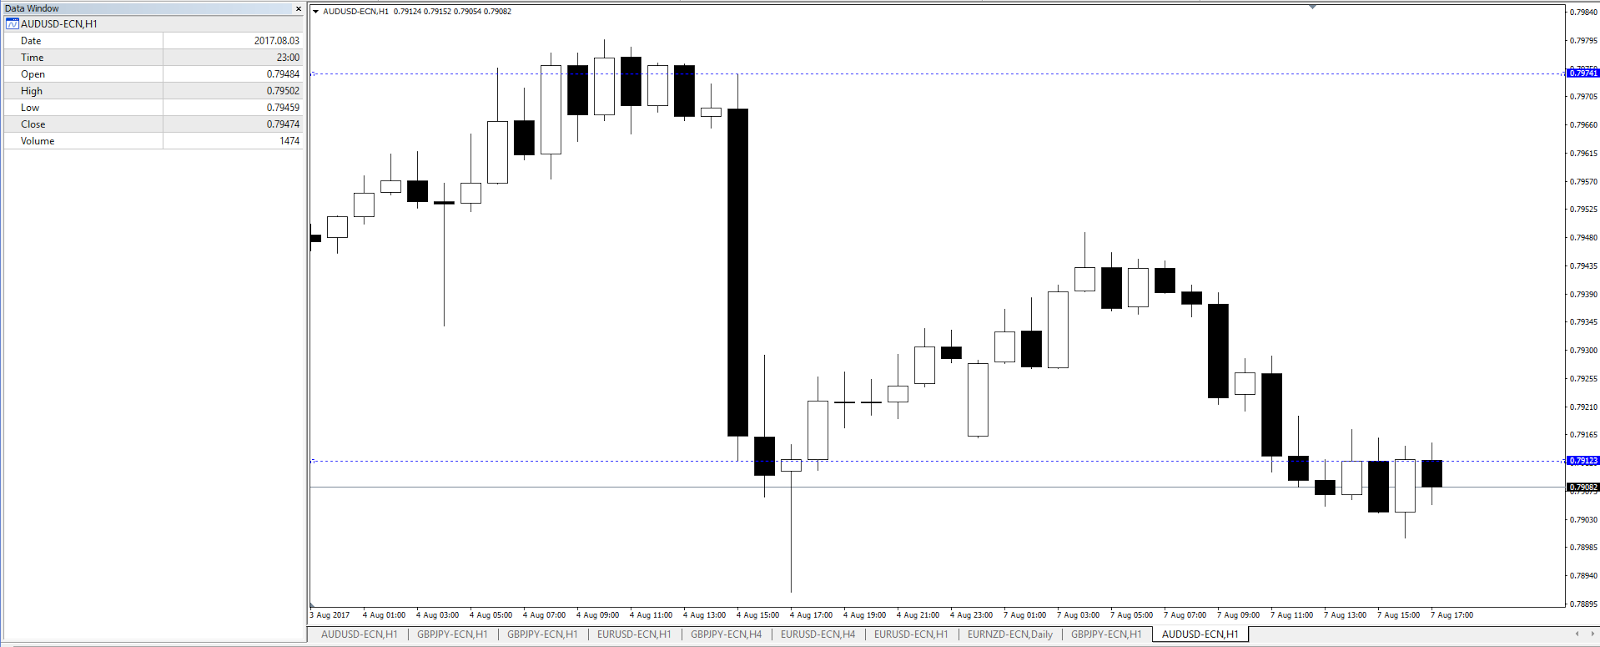 Quelle: AUD/USD H1 Chart, Admiral Markets Platform, 3.-7. August